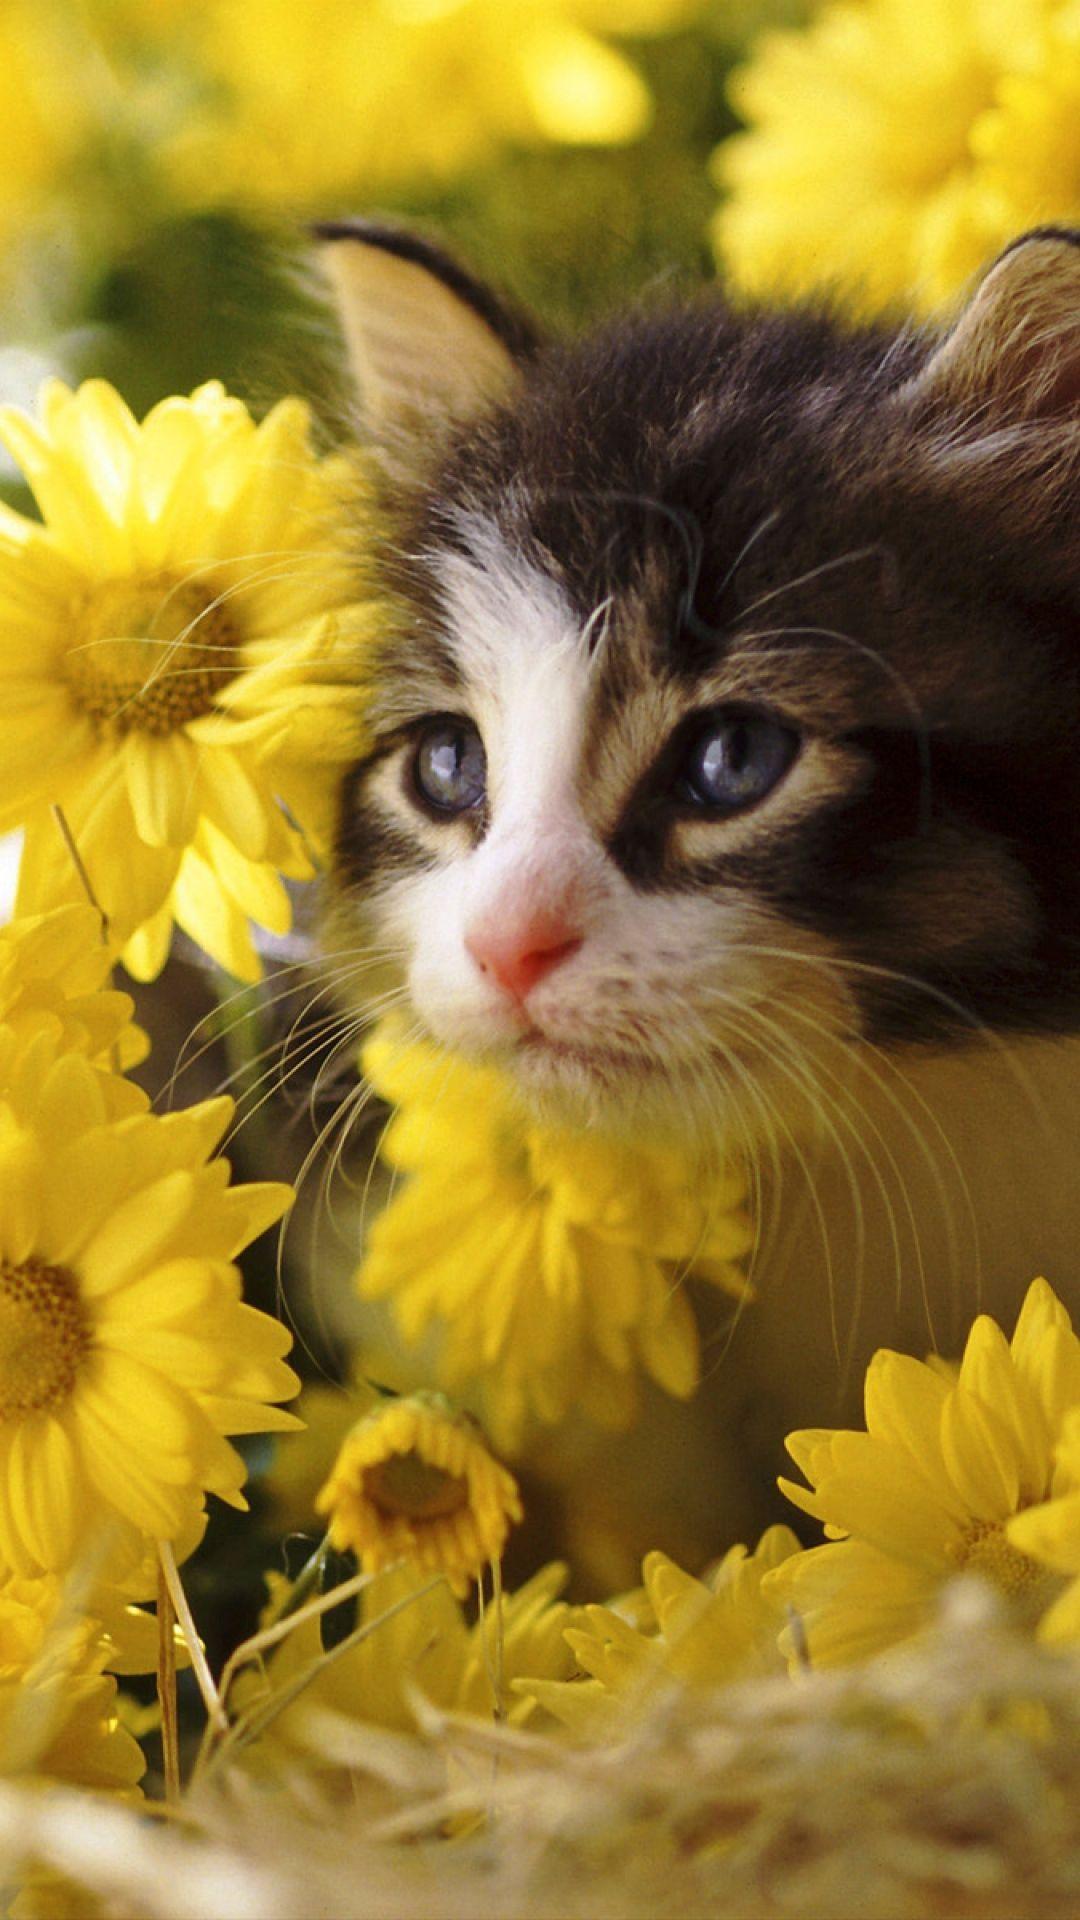 Kitten Flowers Yellow Baby Cats Kittens Cutest Pretty Cats